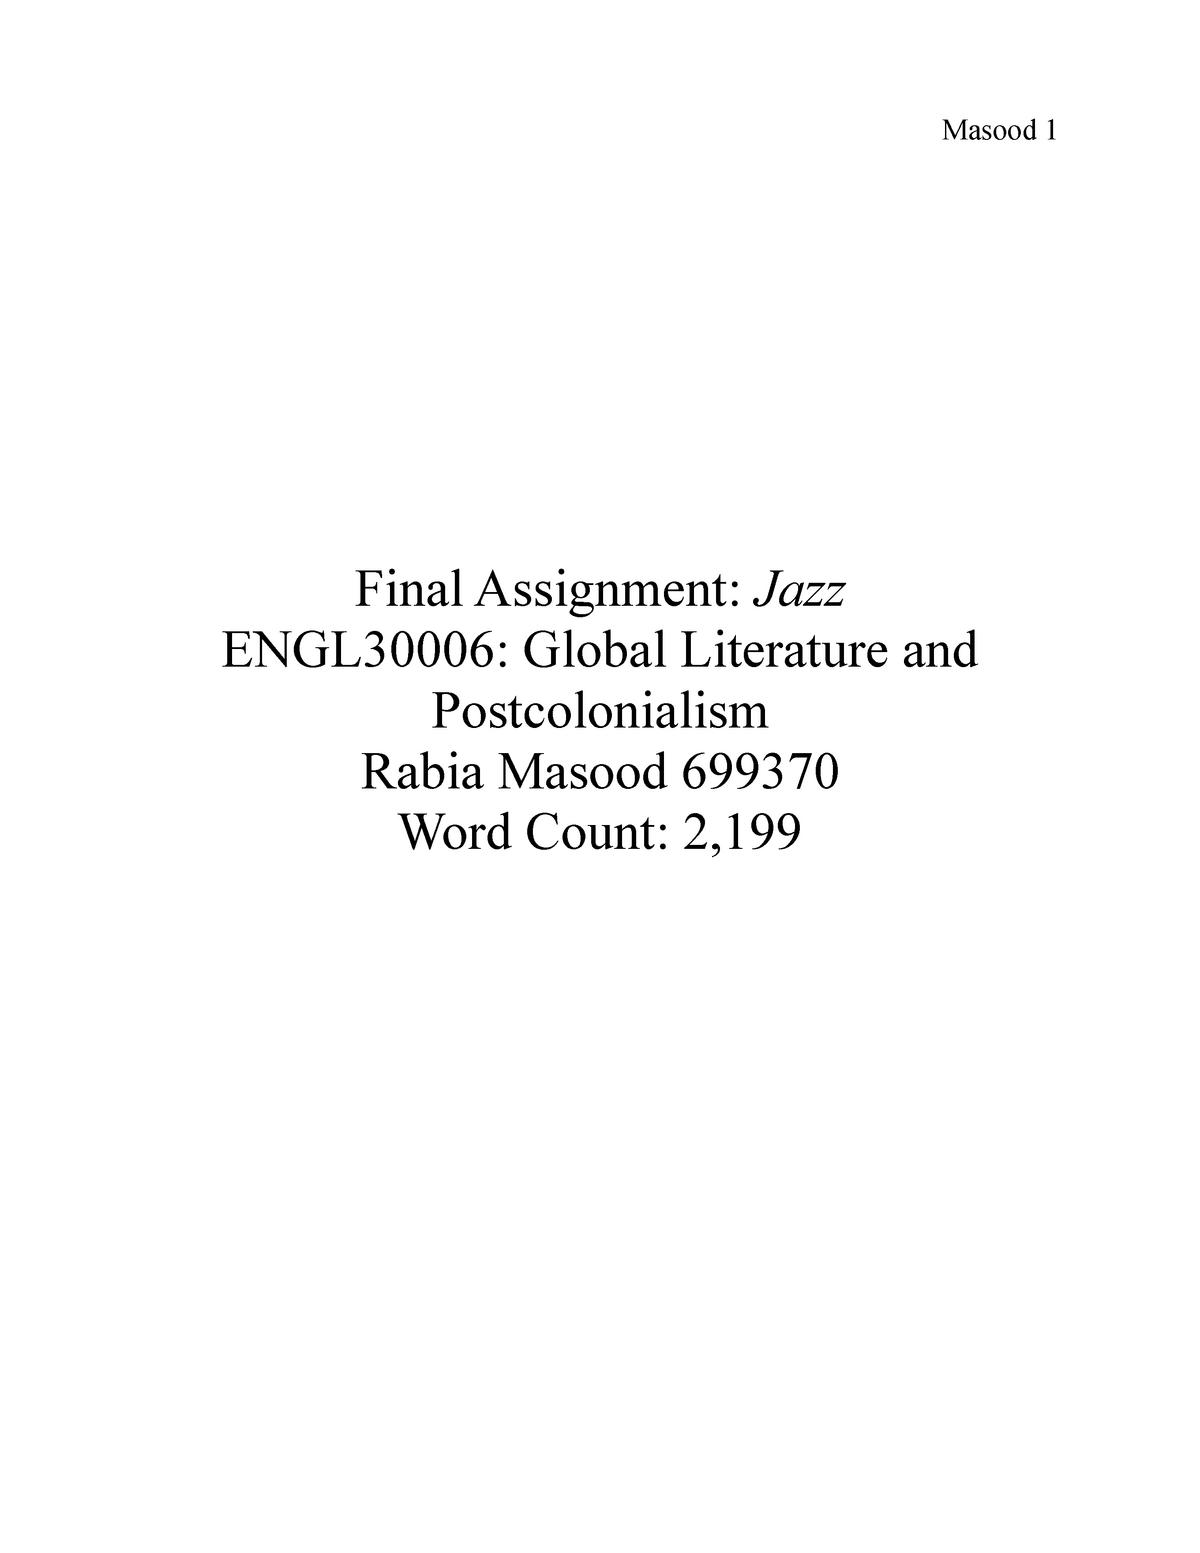 Essay